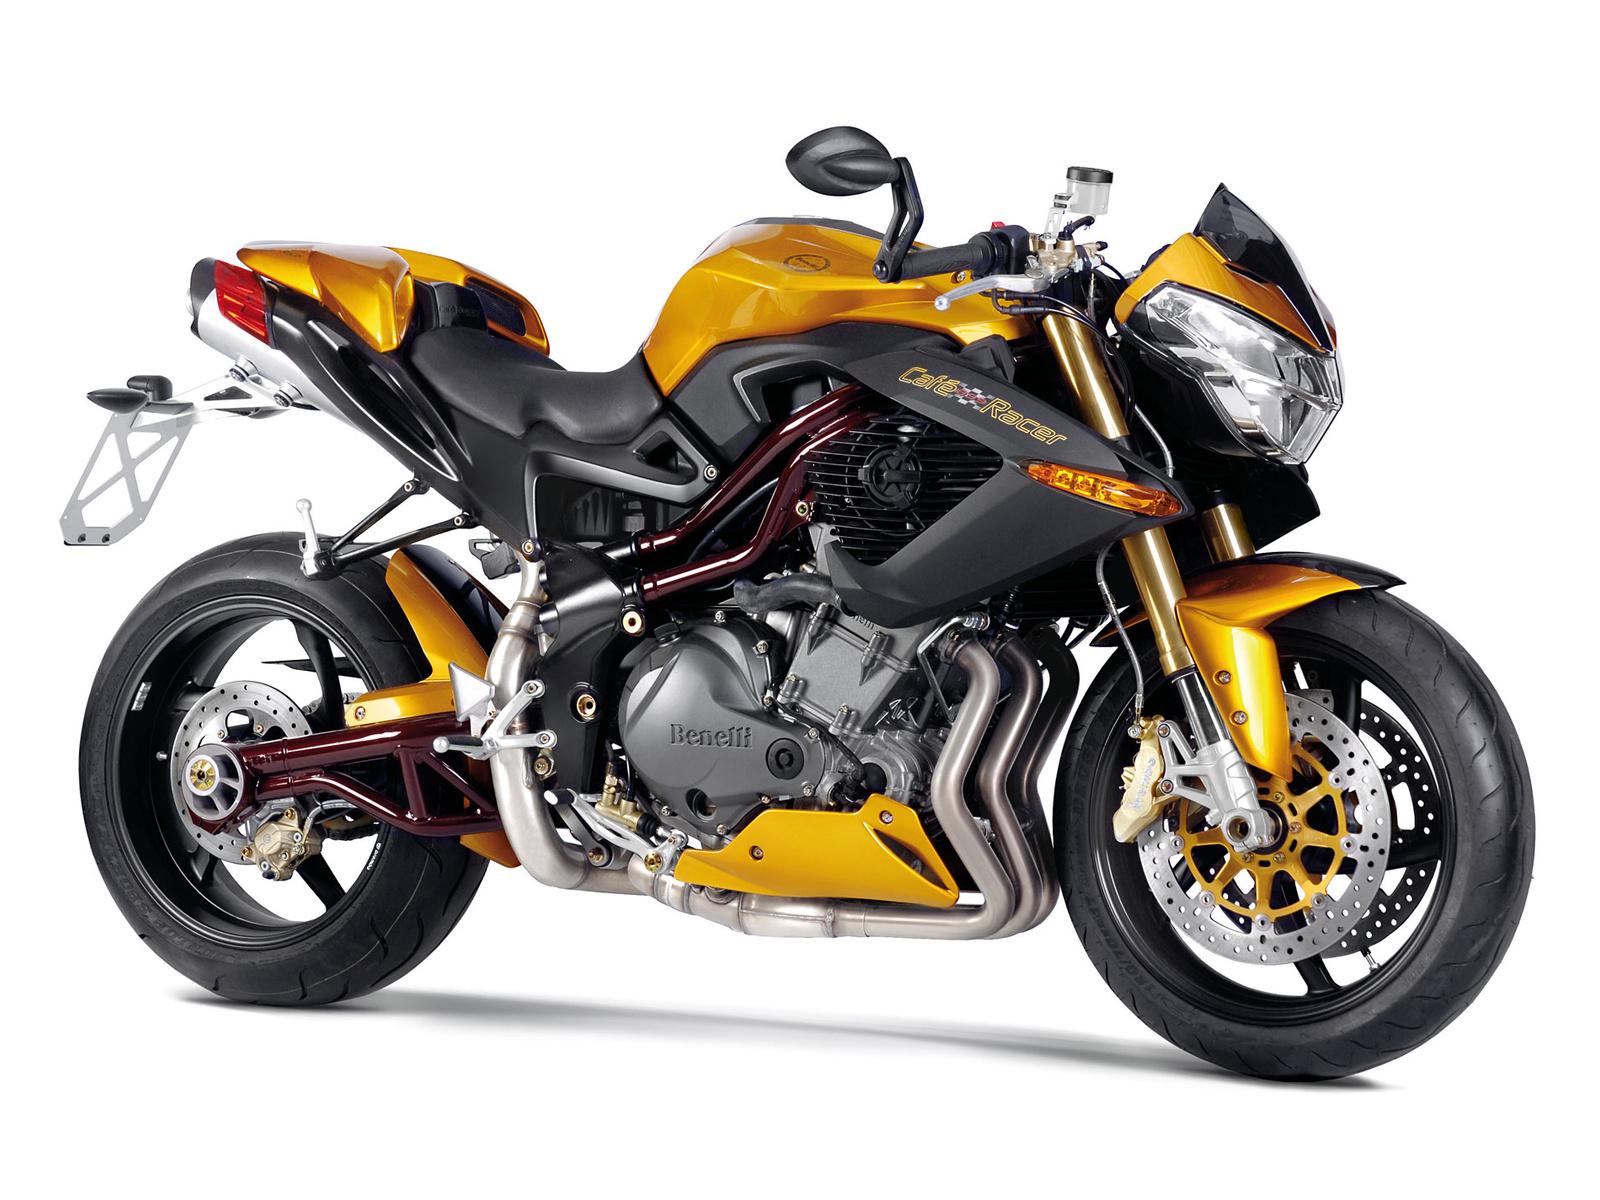 benelli tnt 899 cafe racer, 2010, benelli, стритфайтер, нейкид, мотоцикл, мото, италия, дизайн, хайтек